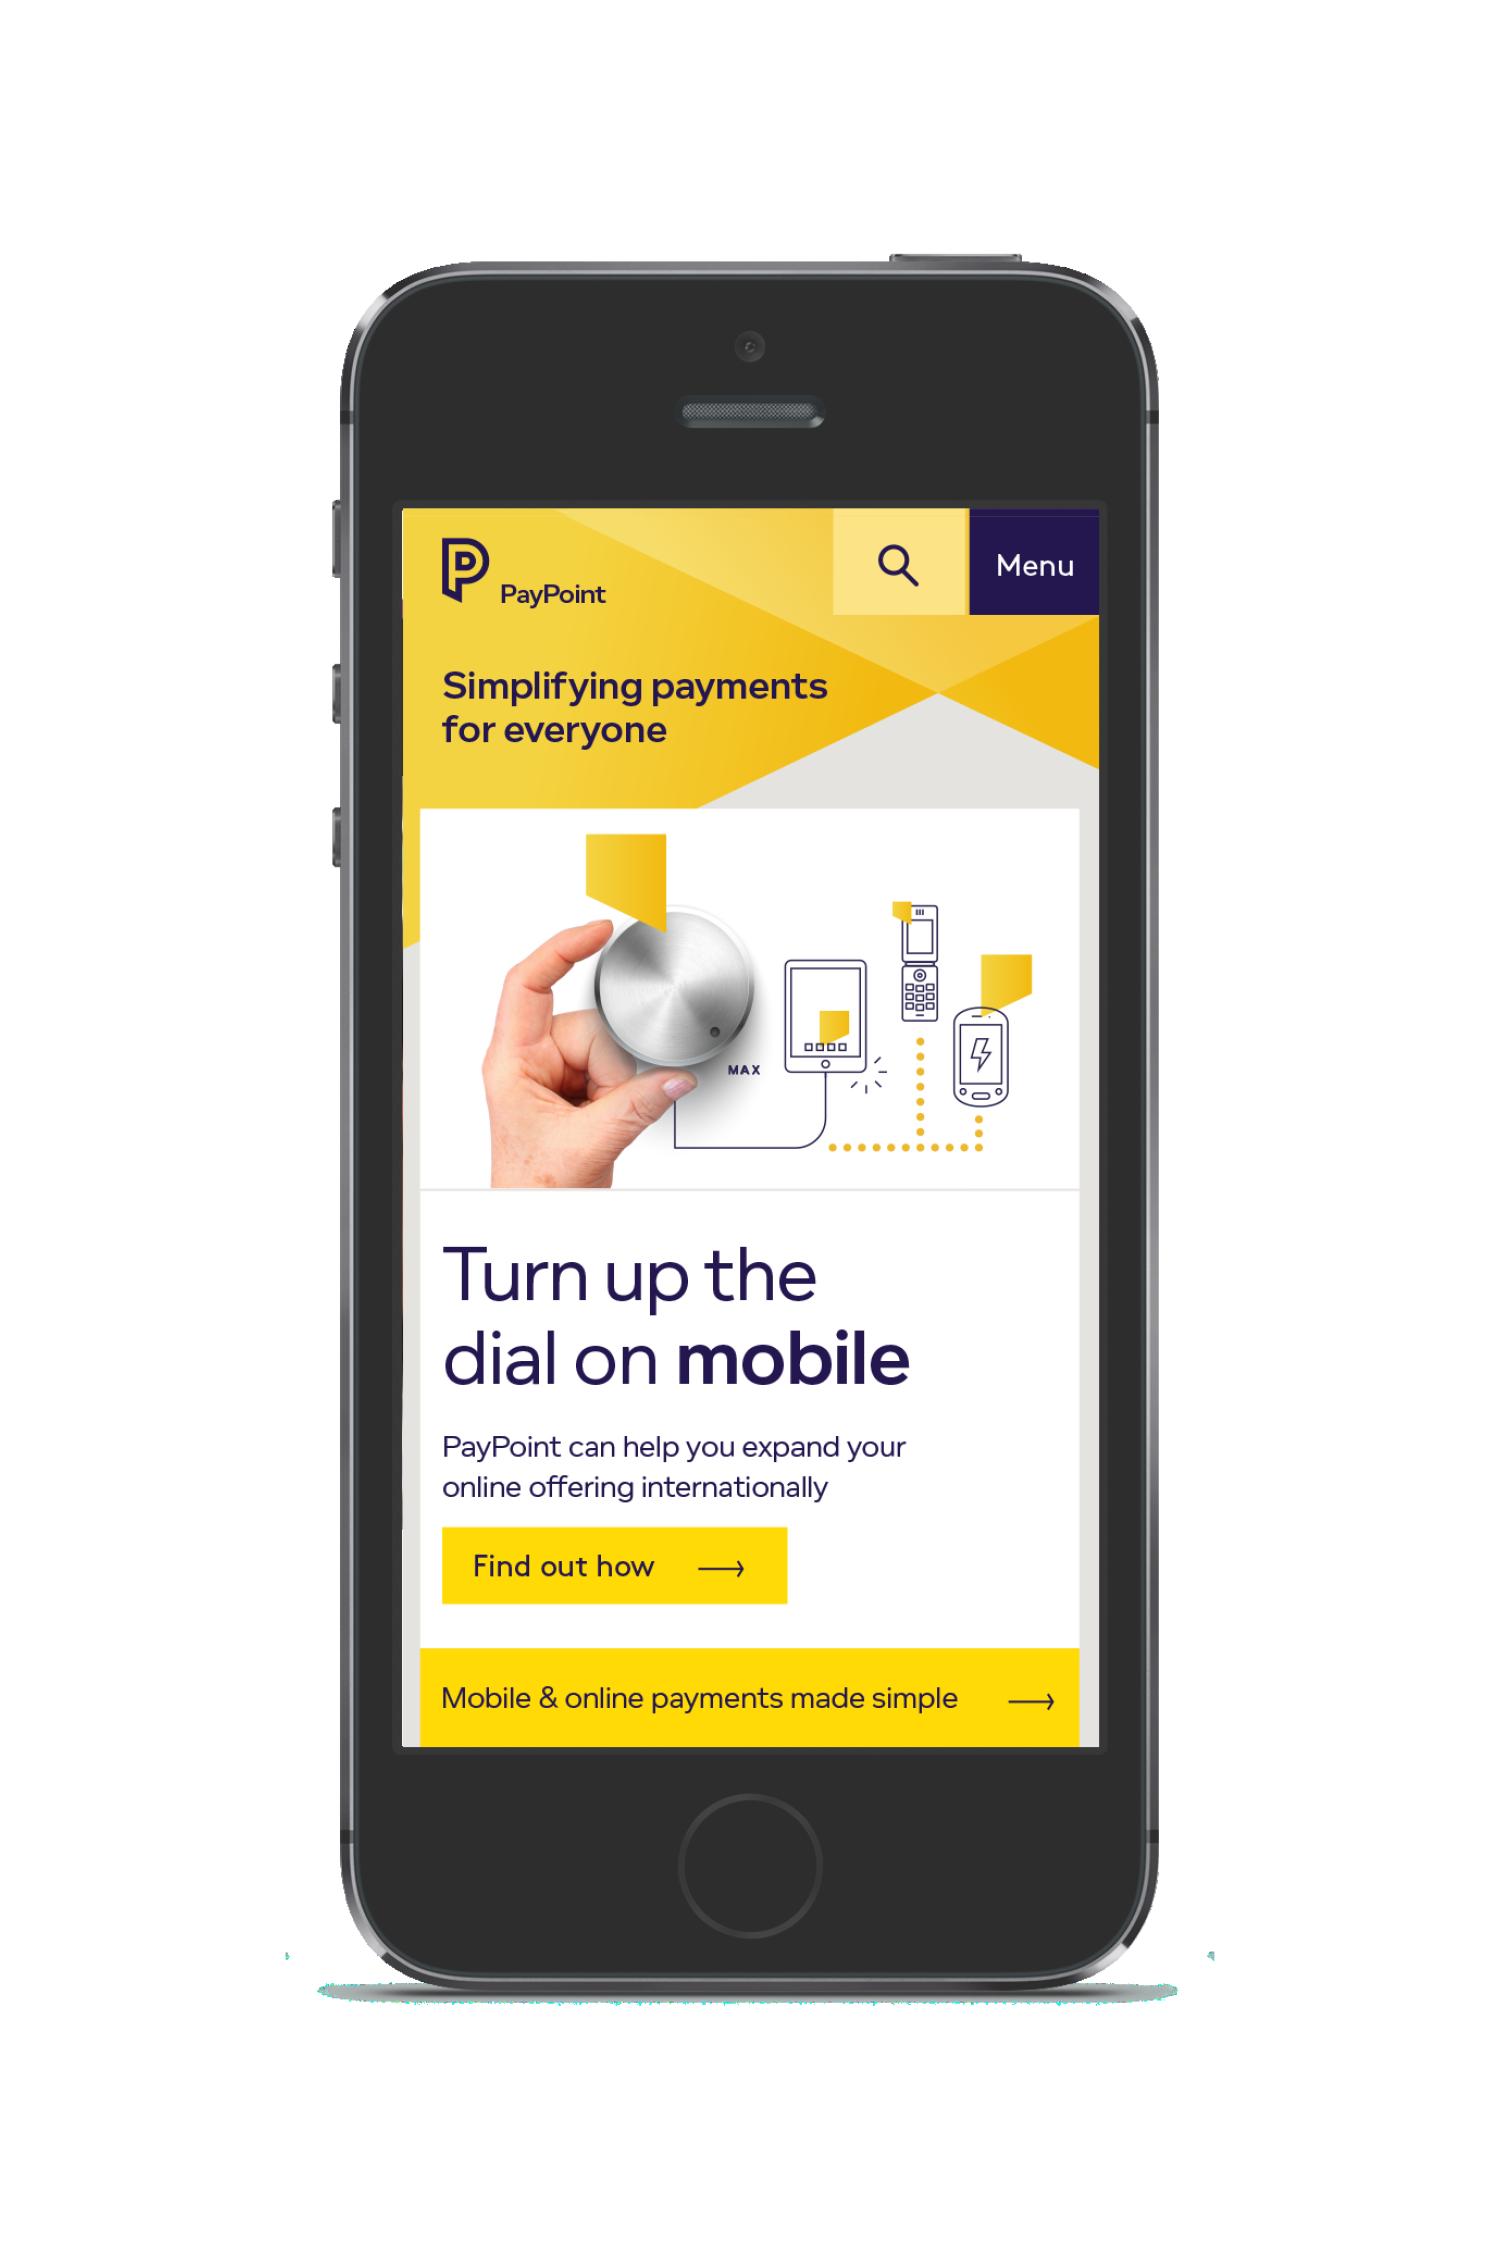 Chris_Pitney_2020_Portfolio_Paypoint_Transparent_Mobile